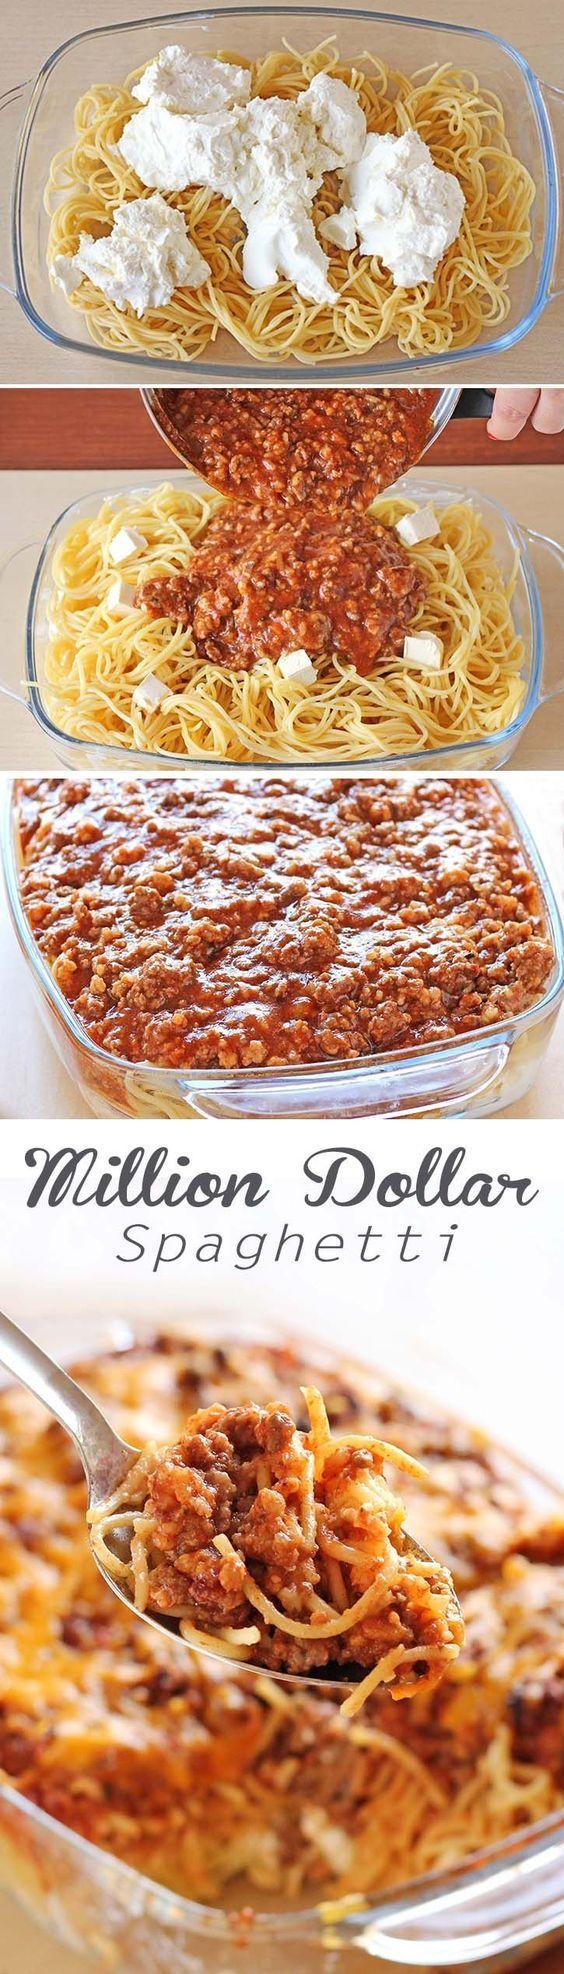 Spaghetti noodles, spaghetti sauce, beef, cottage cheese, sour cream and cream cheese! This tastes like a million bucks.